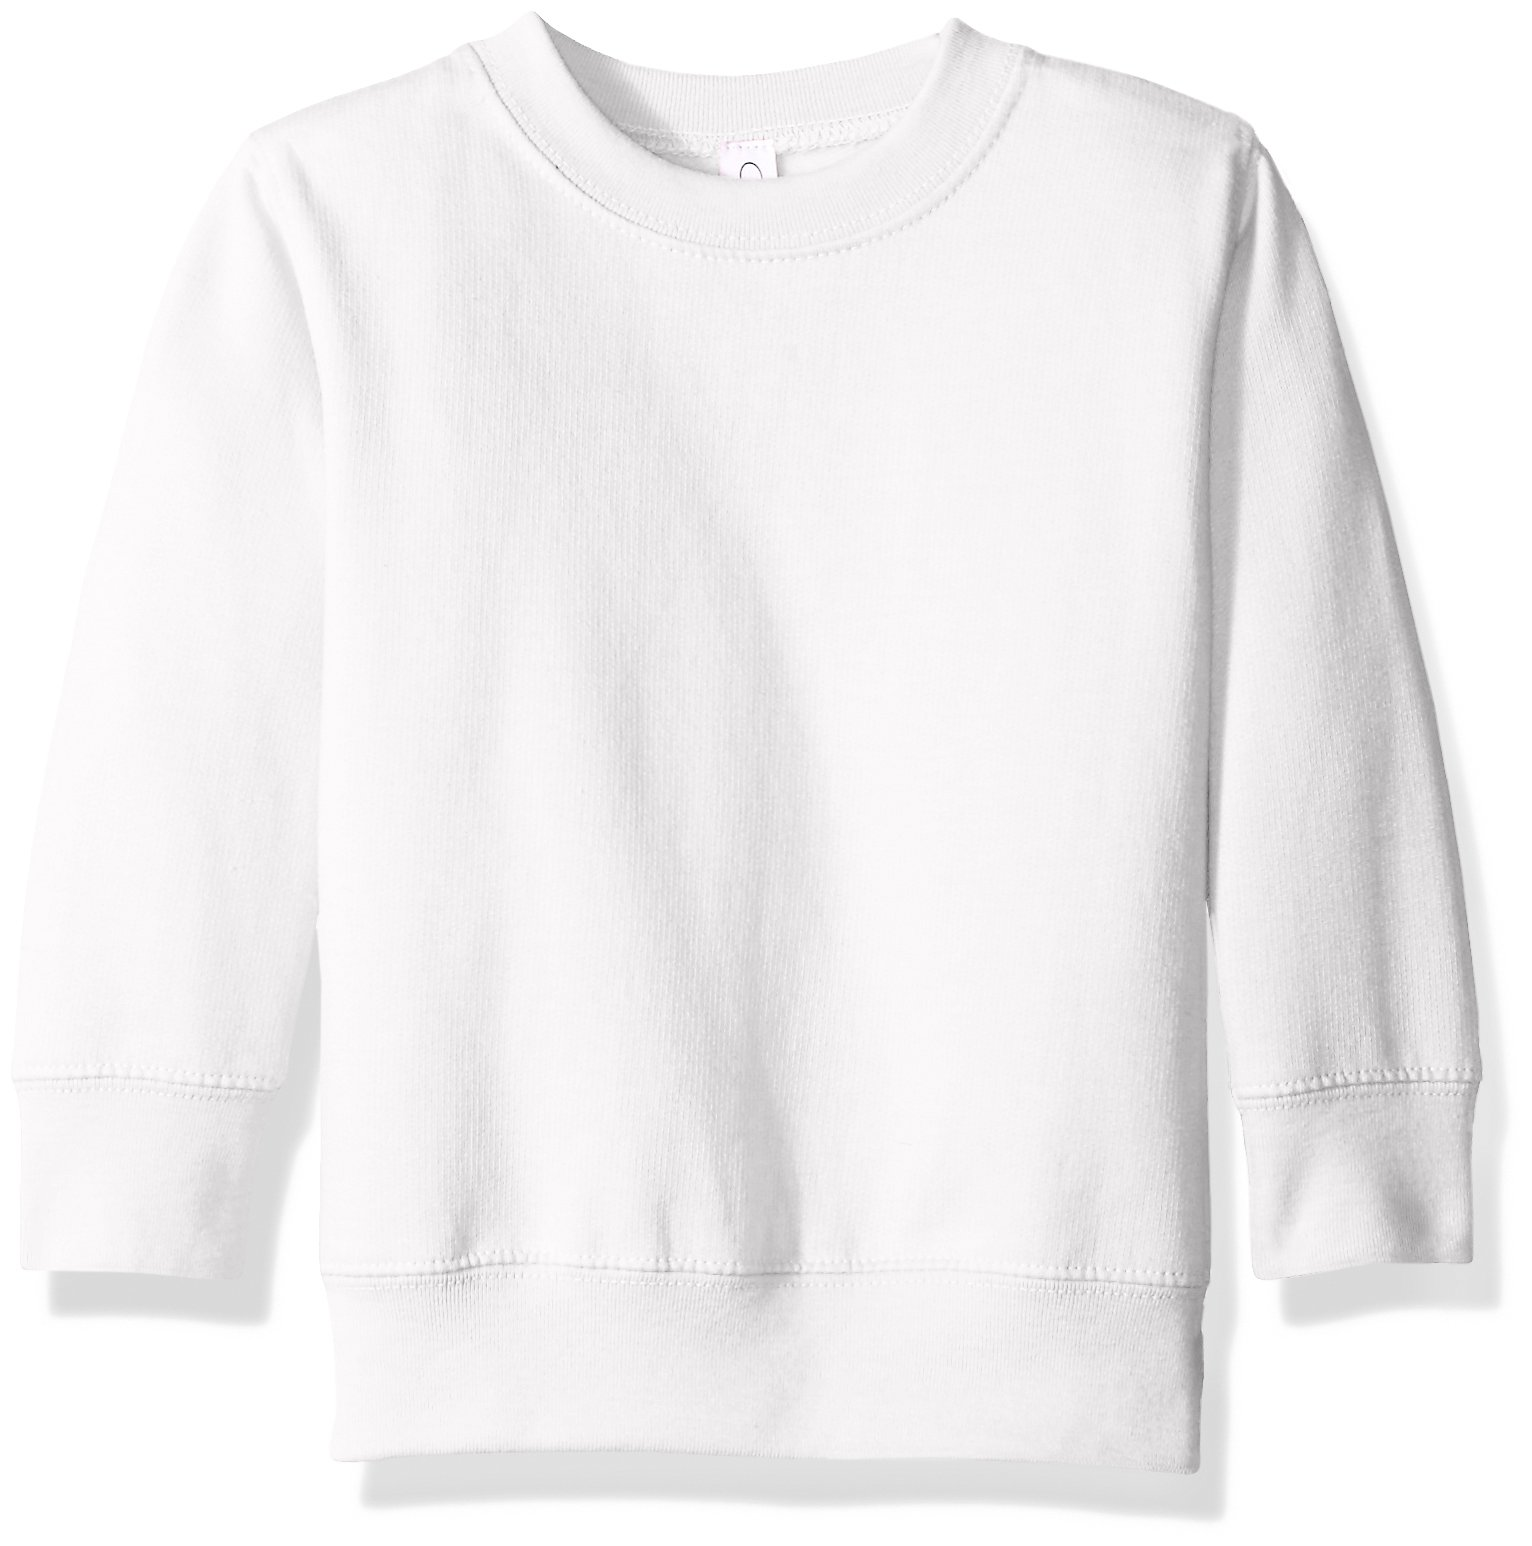 Clementine Apparel Little Girls (2-7) Apparel Toddler's Fleece Sweatshirt, White, 5/6